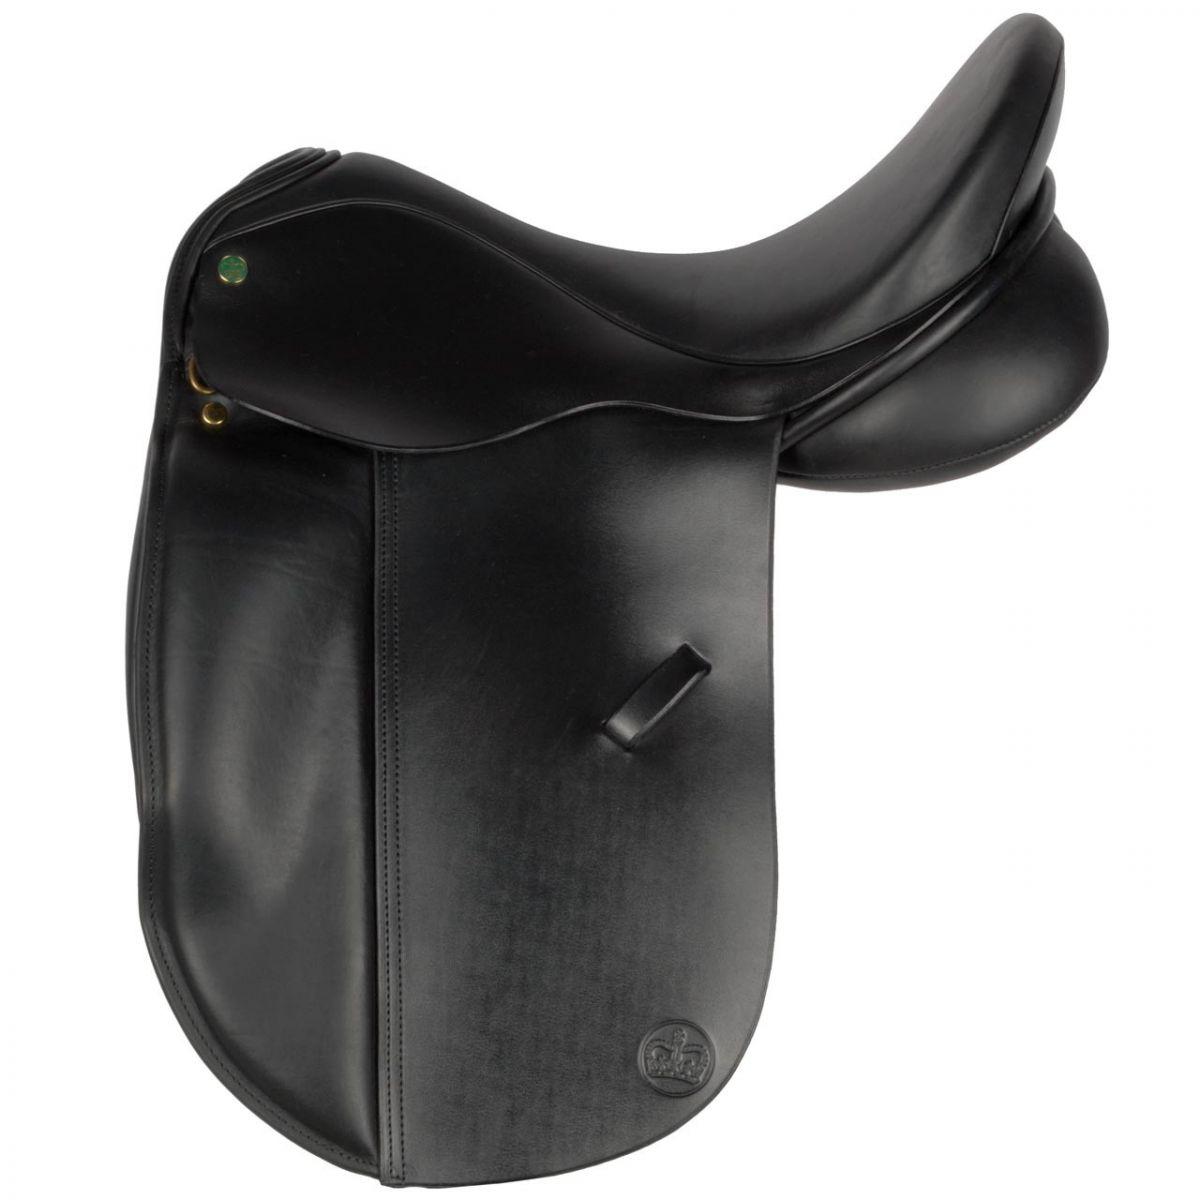 Ideal Suzannah dressuurzadel zwart maat:17.5 mw